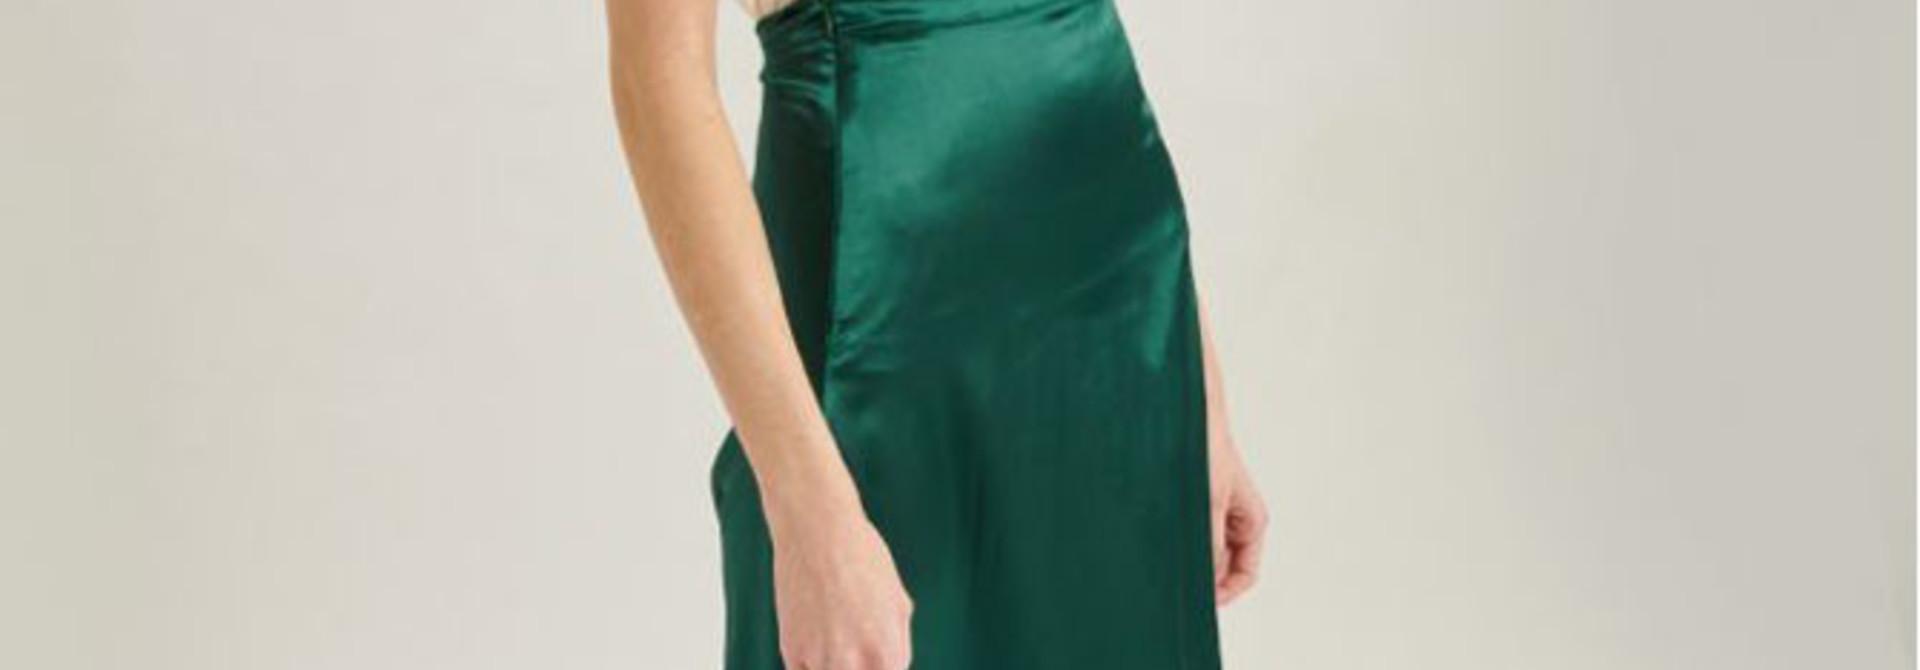 Juuna satin skirt Green